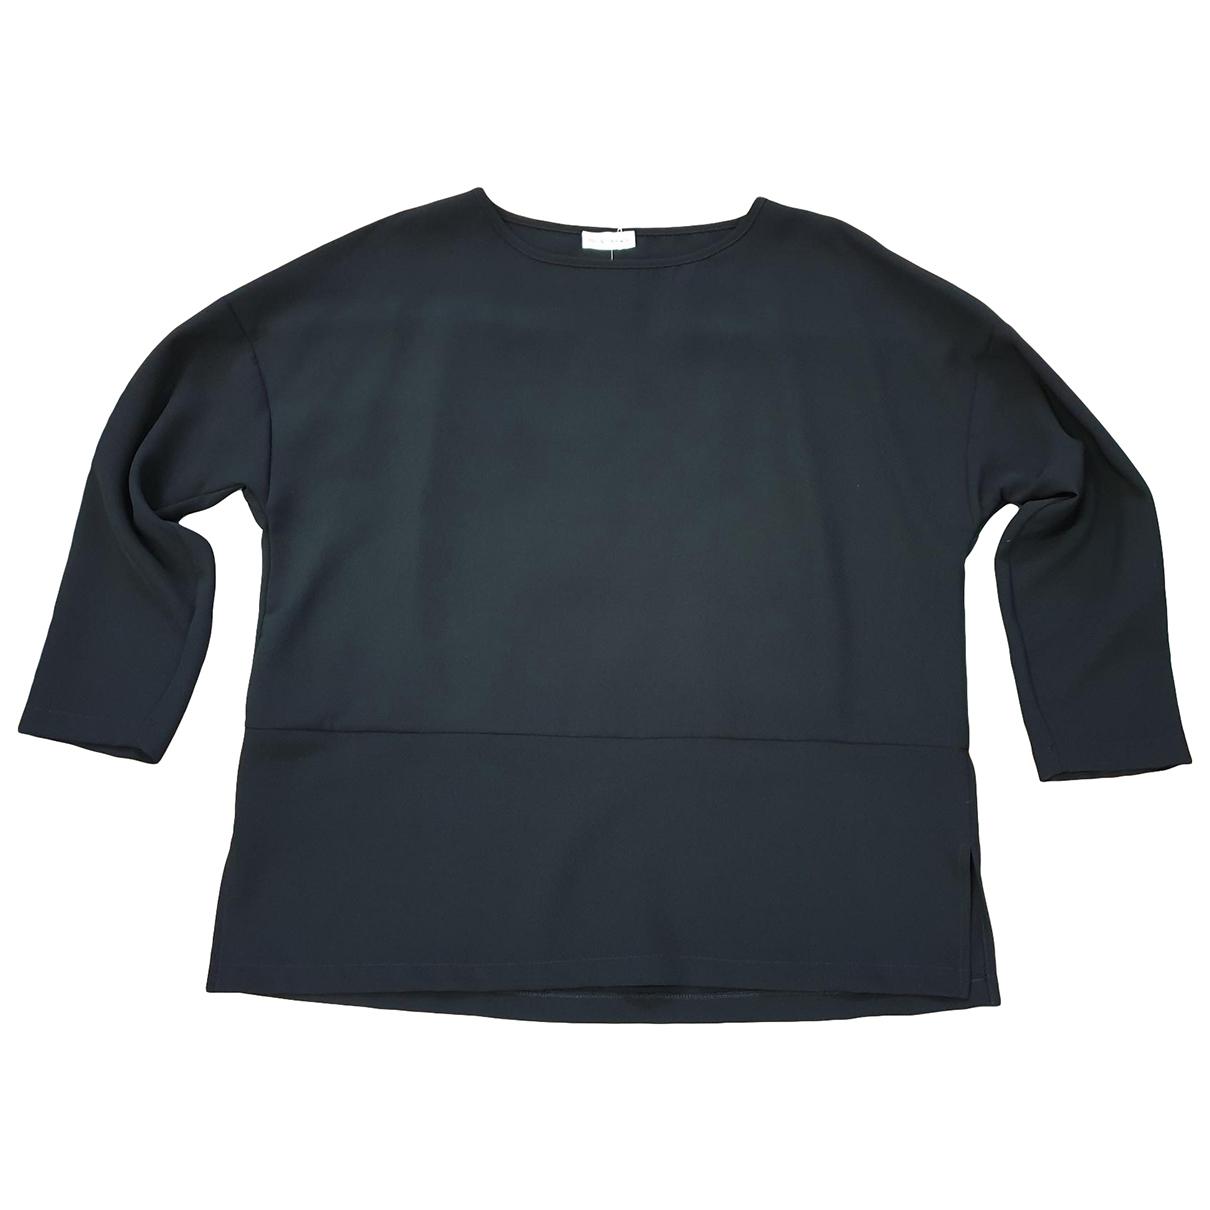 Krizia \N Top in  Schwarz Polyester